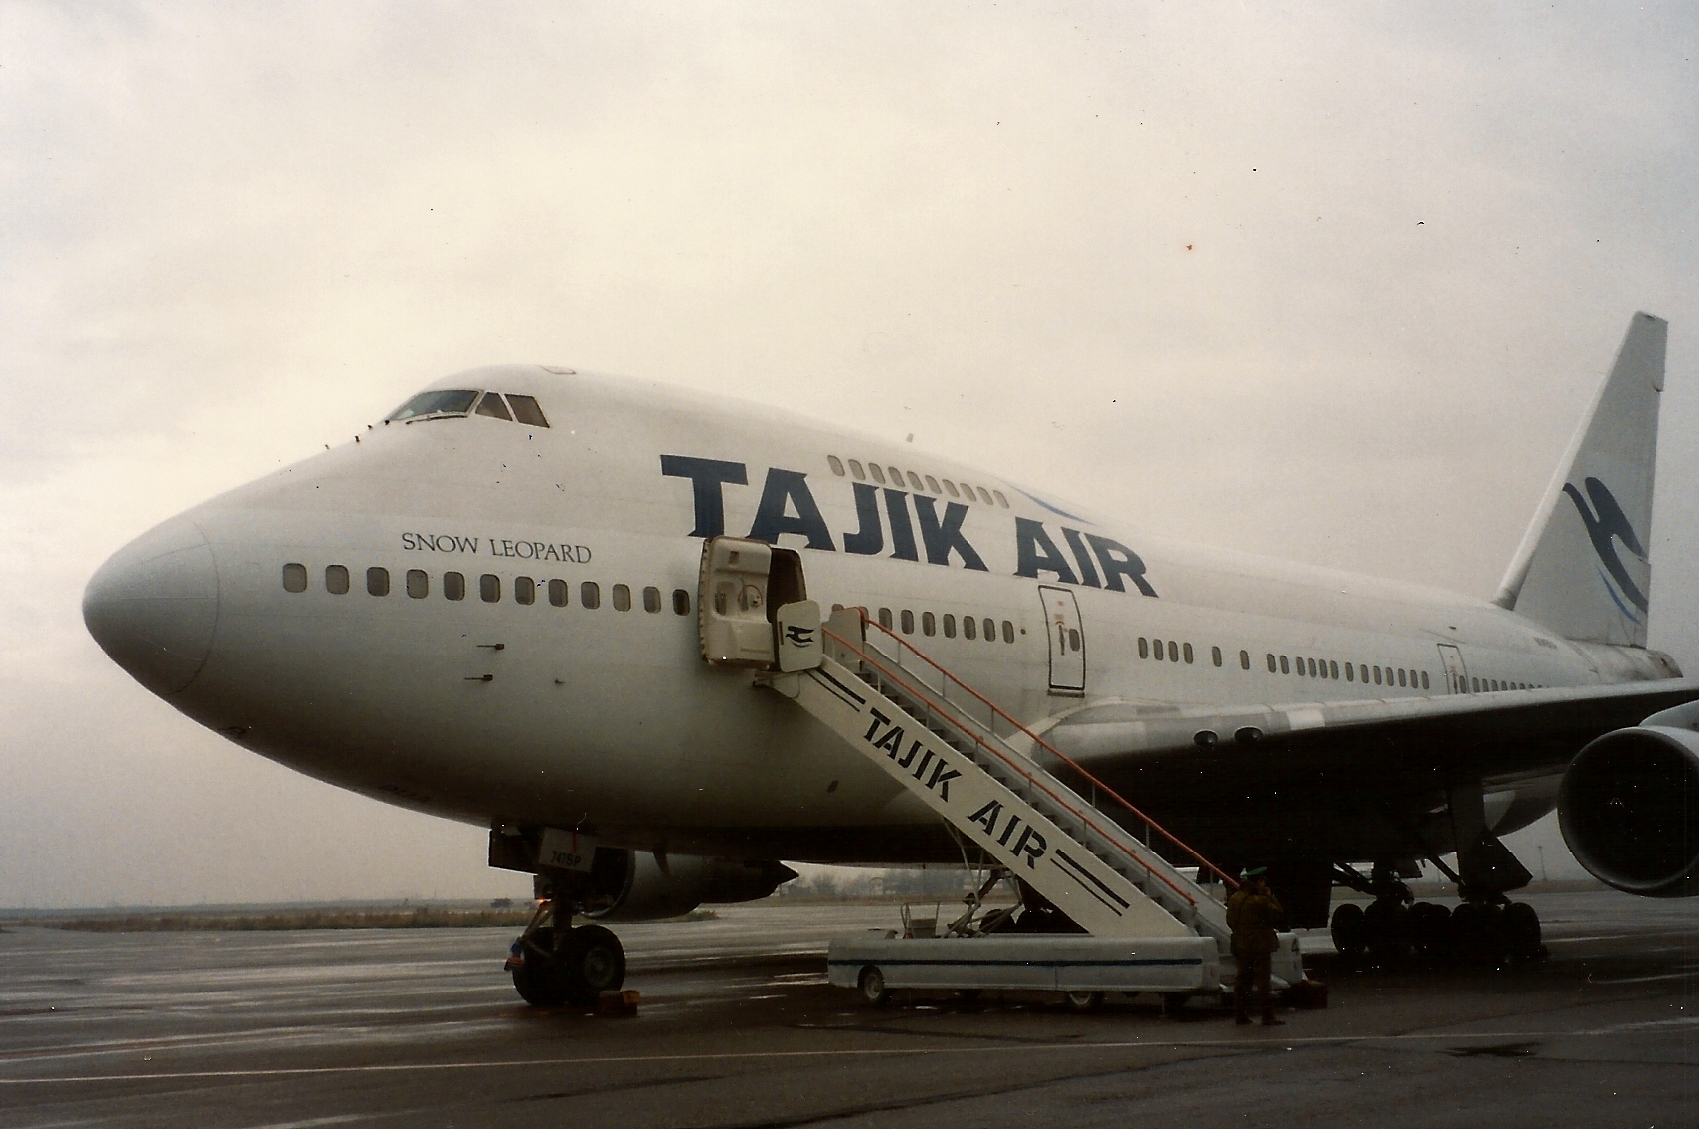 Названа причина ЧС в самолете, летевшем из Москвы в Таджикистан